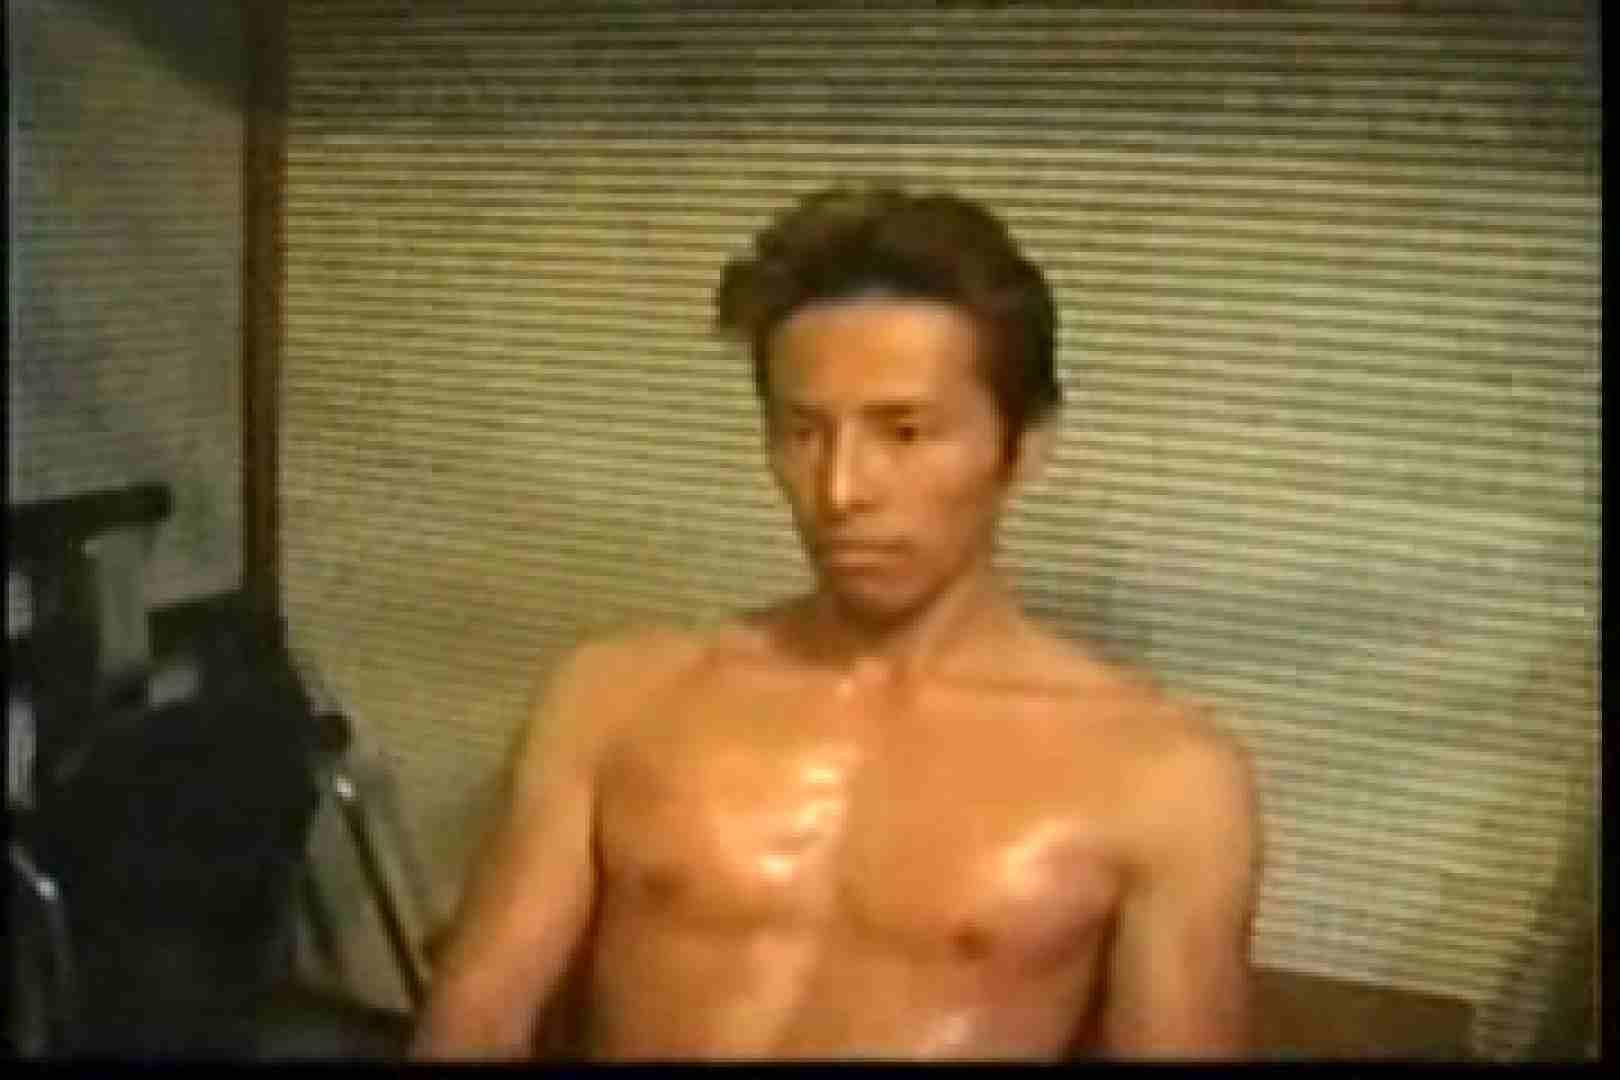 Nostalgic various fucks.vol.01  野外露出動画 | 企画 ゲイ素人エロ画像 81pic 46